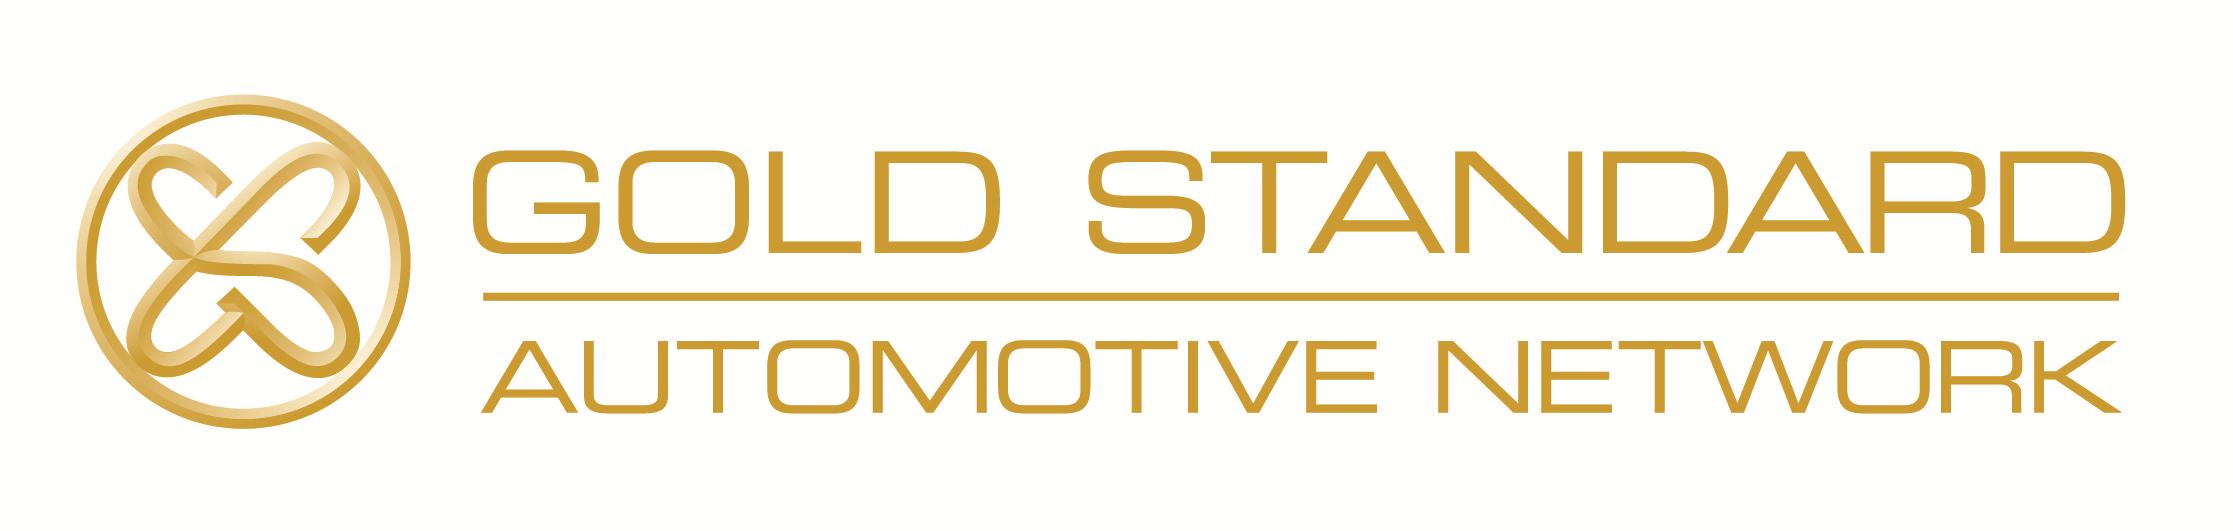 Gold Standard Automotive Network Company Logo